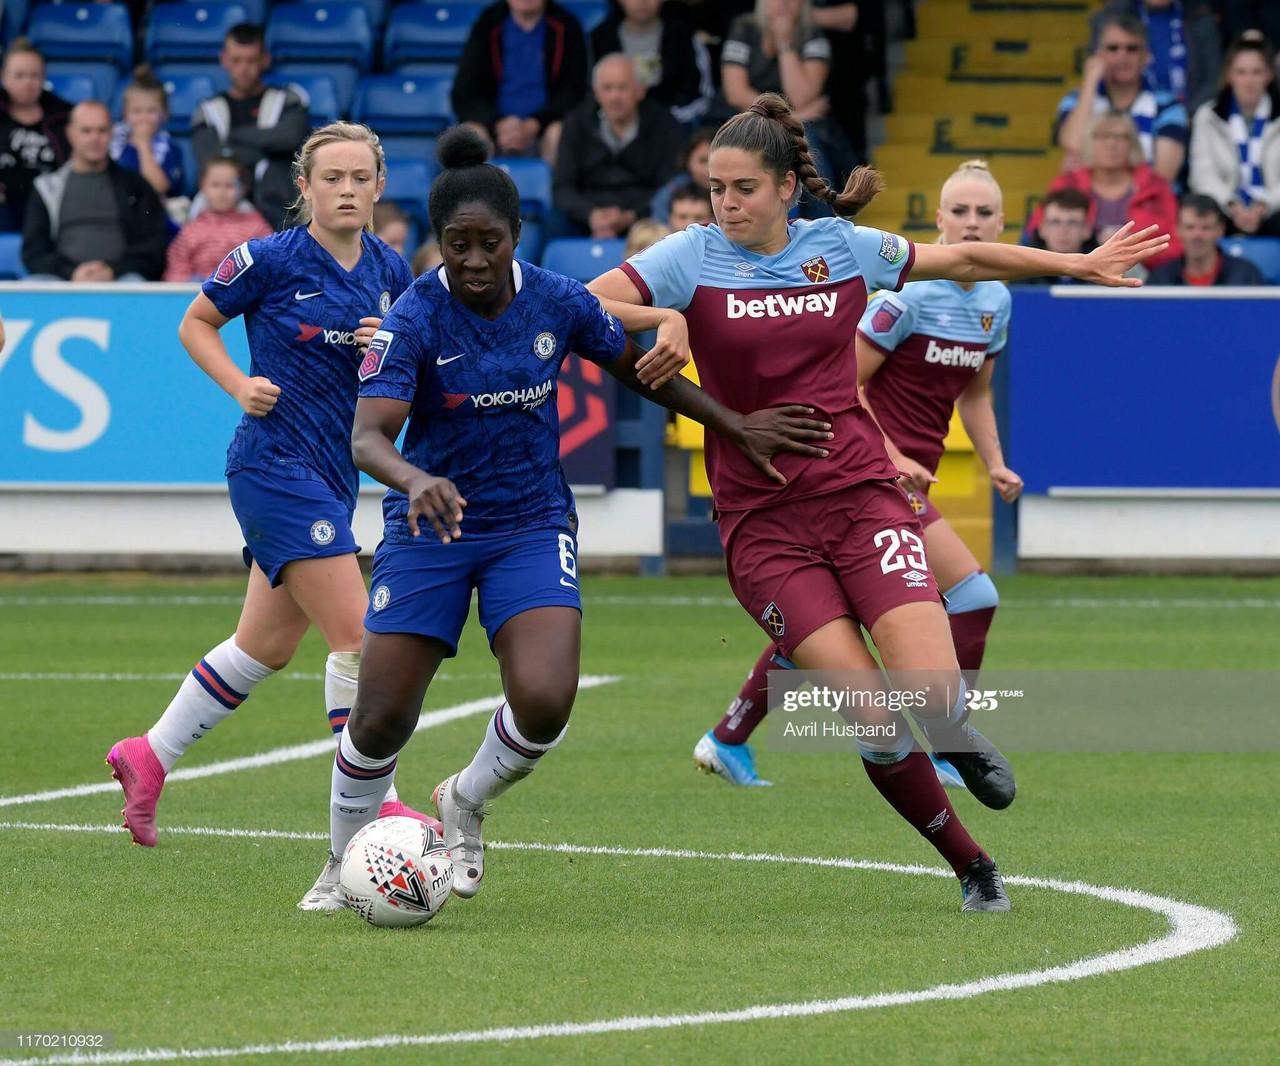 Chelsea Women 19/20 Season Review: Chelsea cruise past West Ham